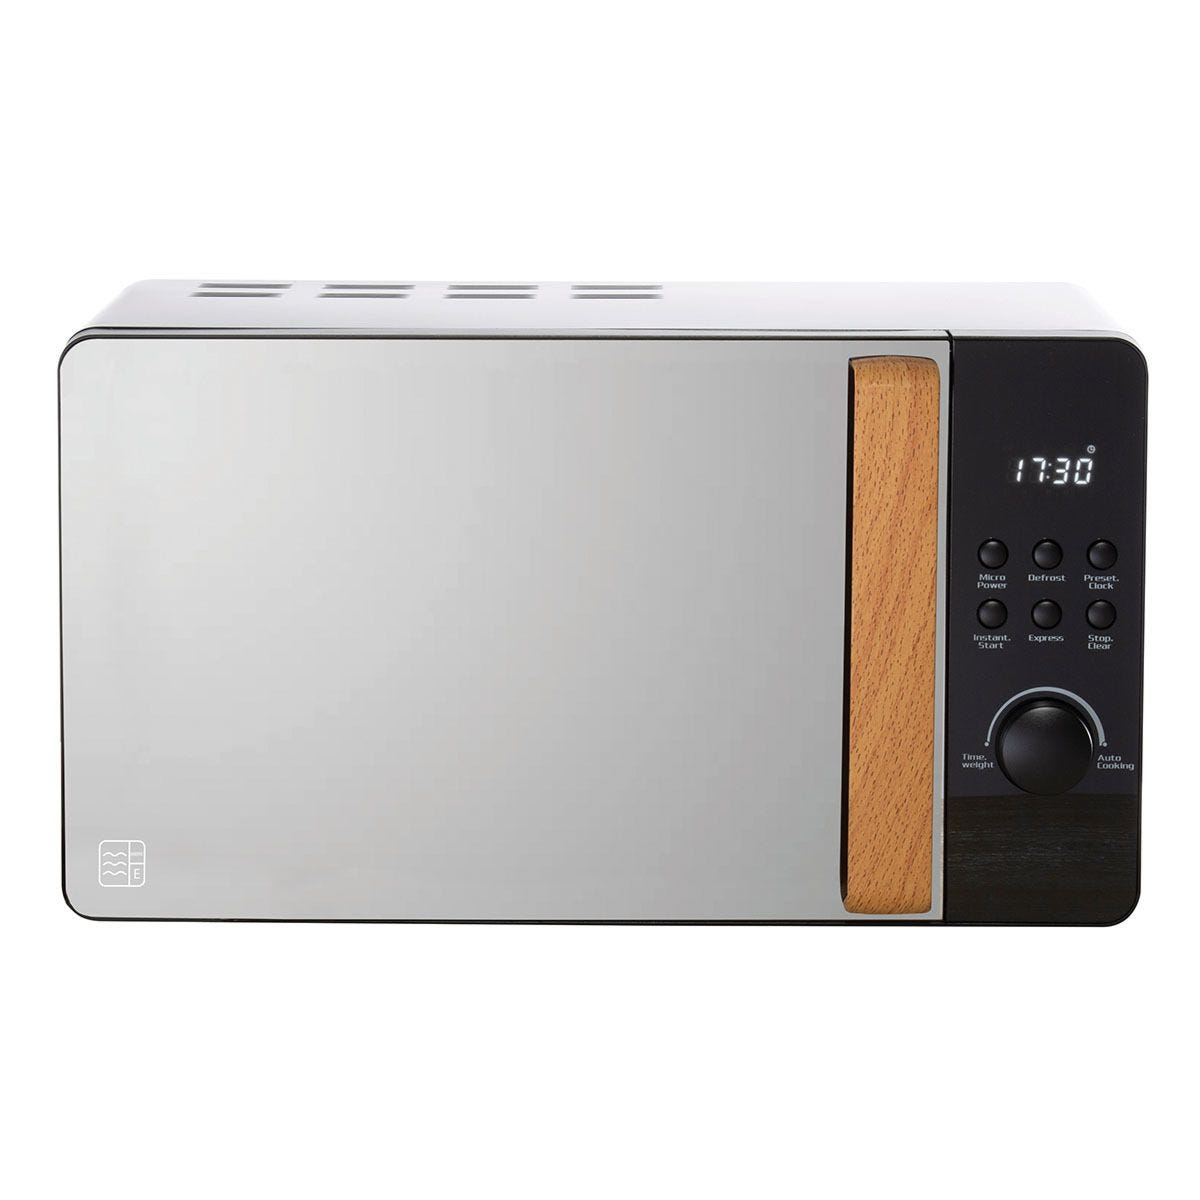 Daewoo SDA1698 Skandik 800W 20L Wooden Handle Digital Microwave – Black